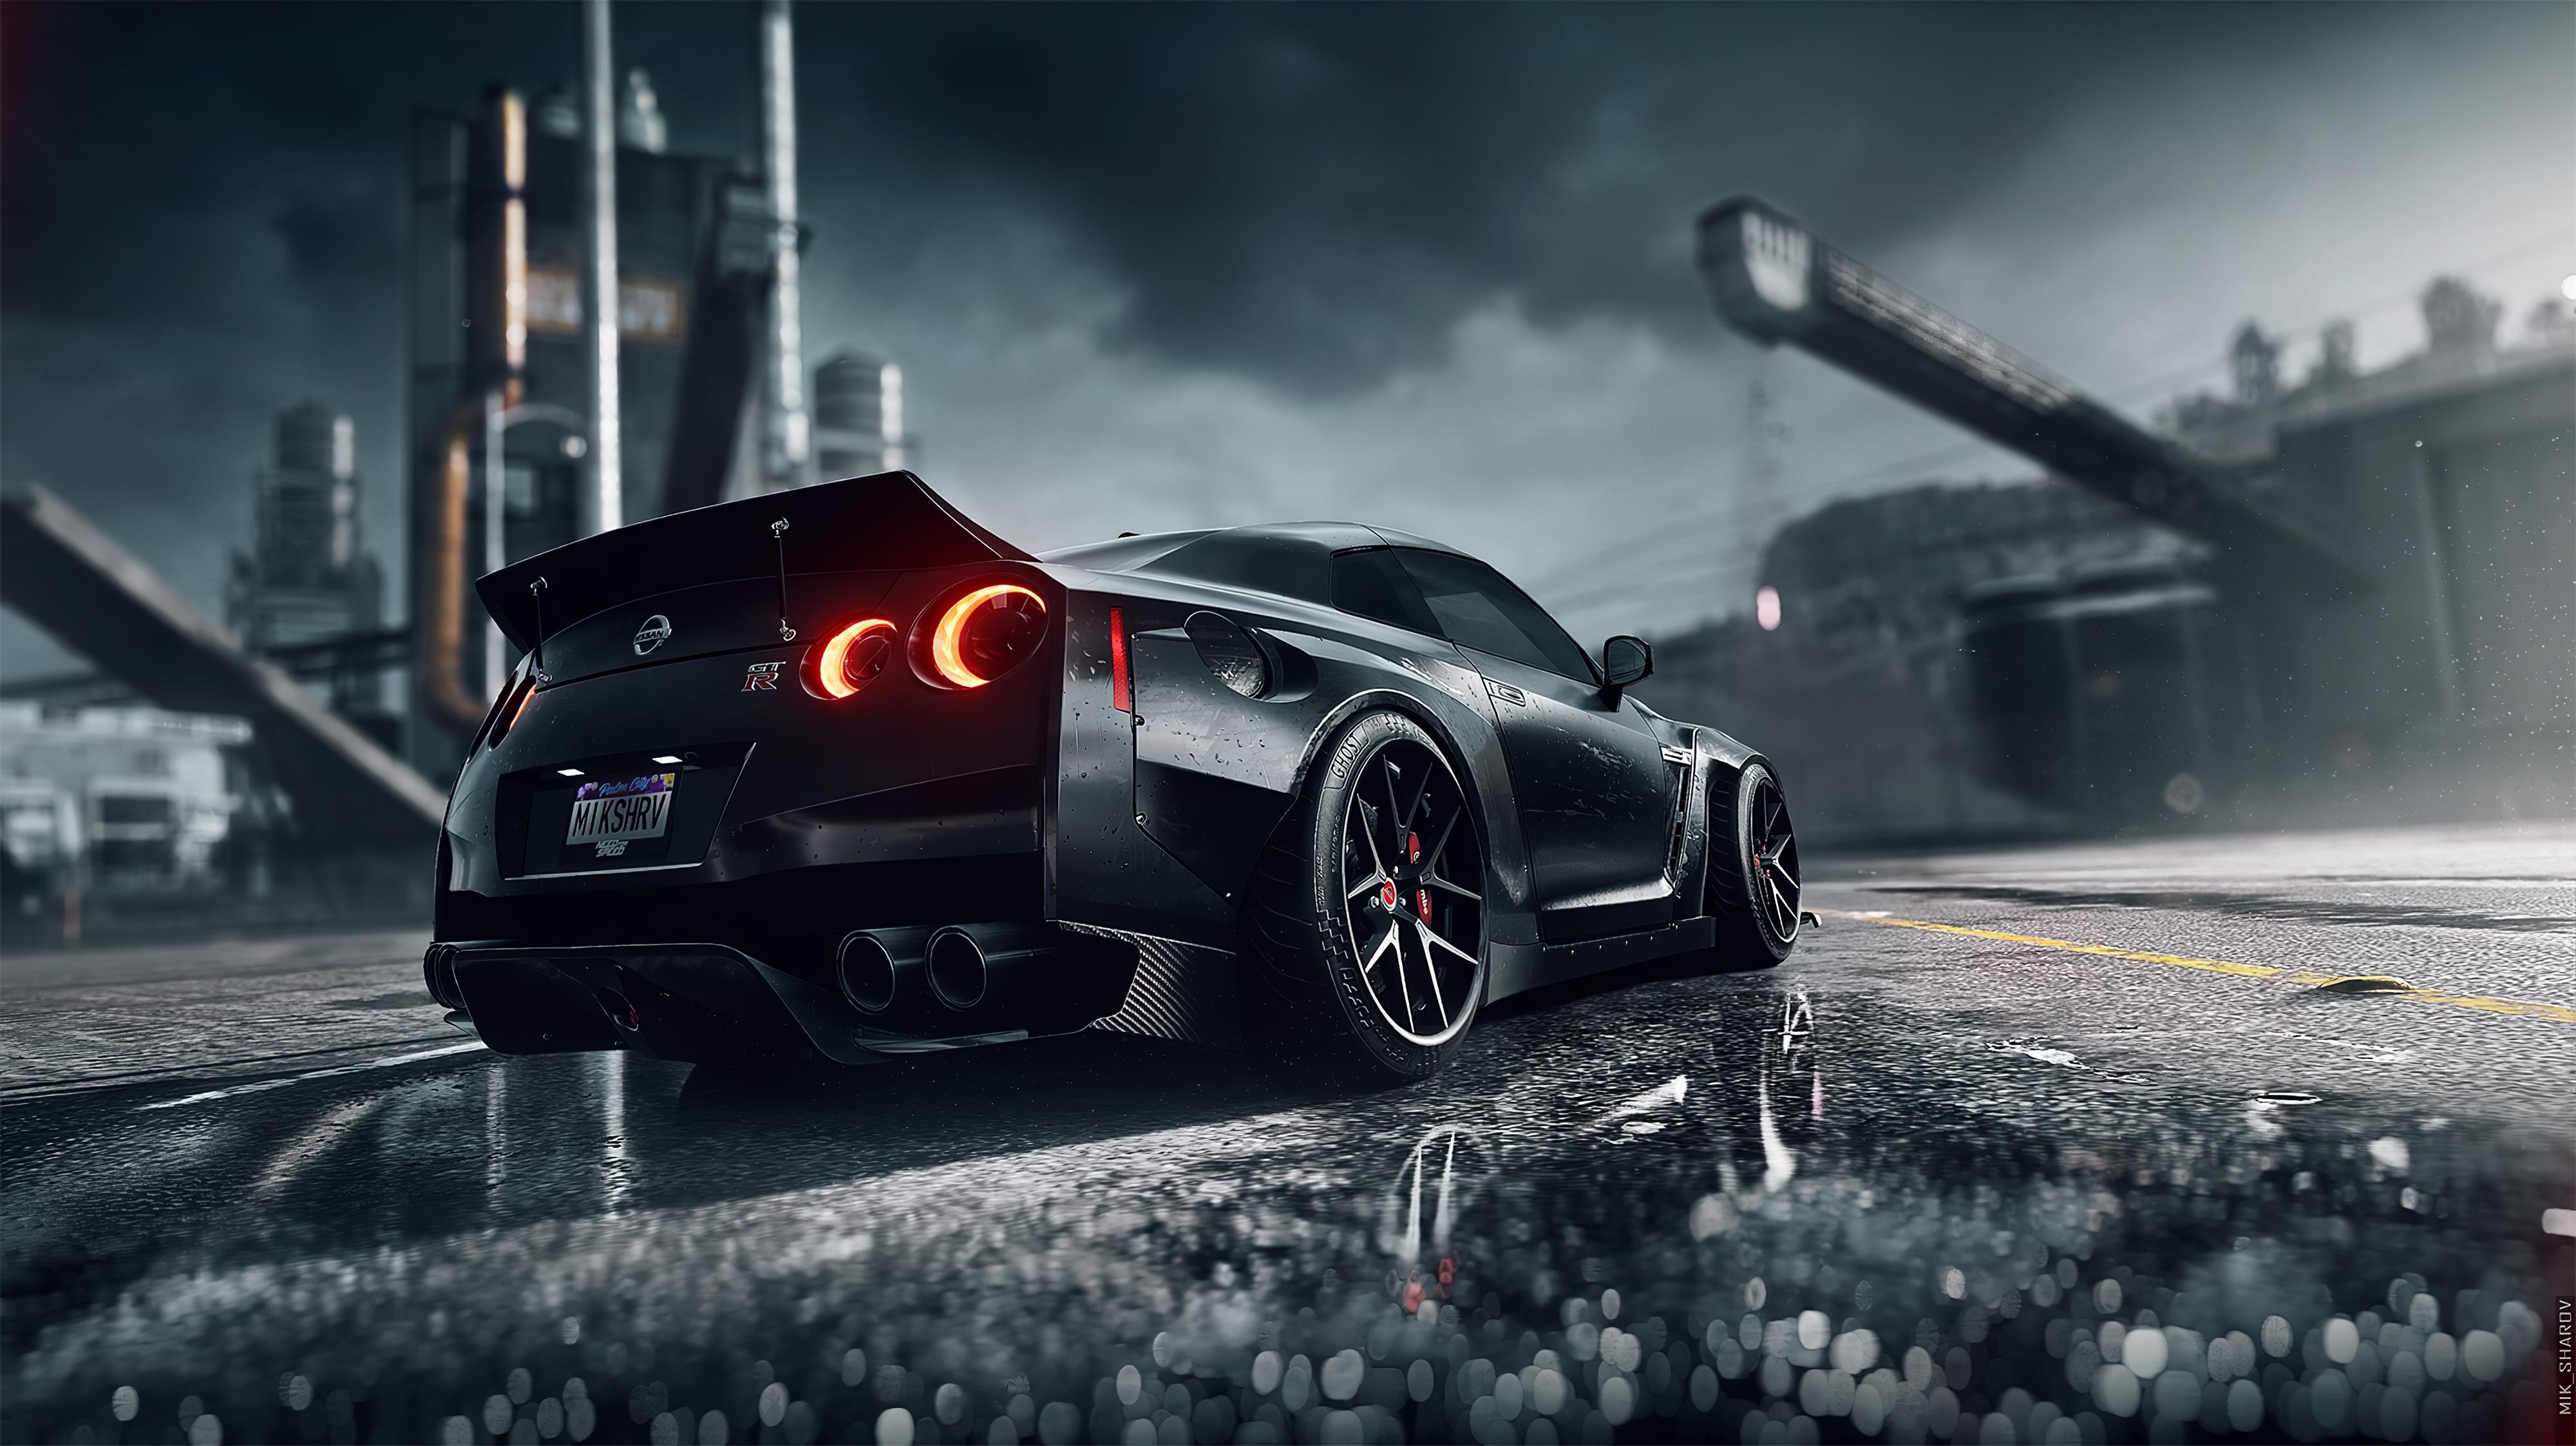 Need For Speed Heat Nissan Gtr 4k Hd Games 4k Wallpapers